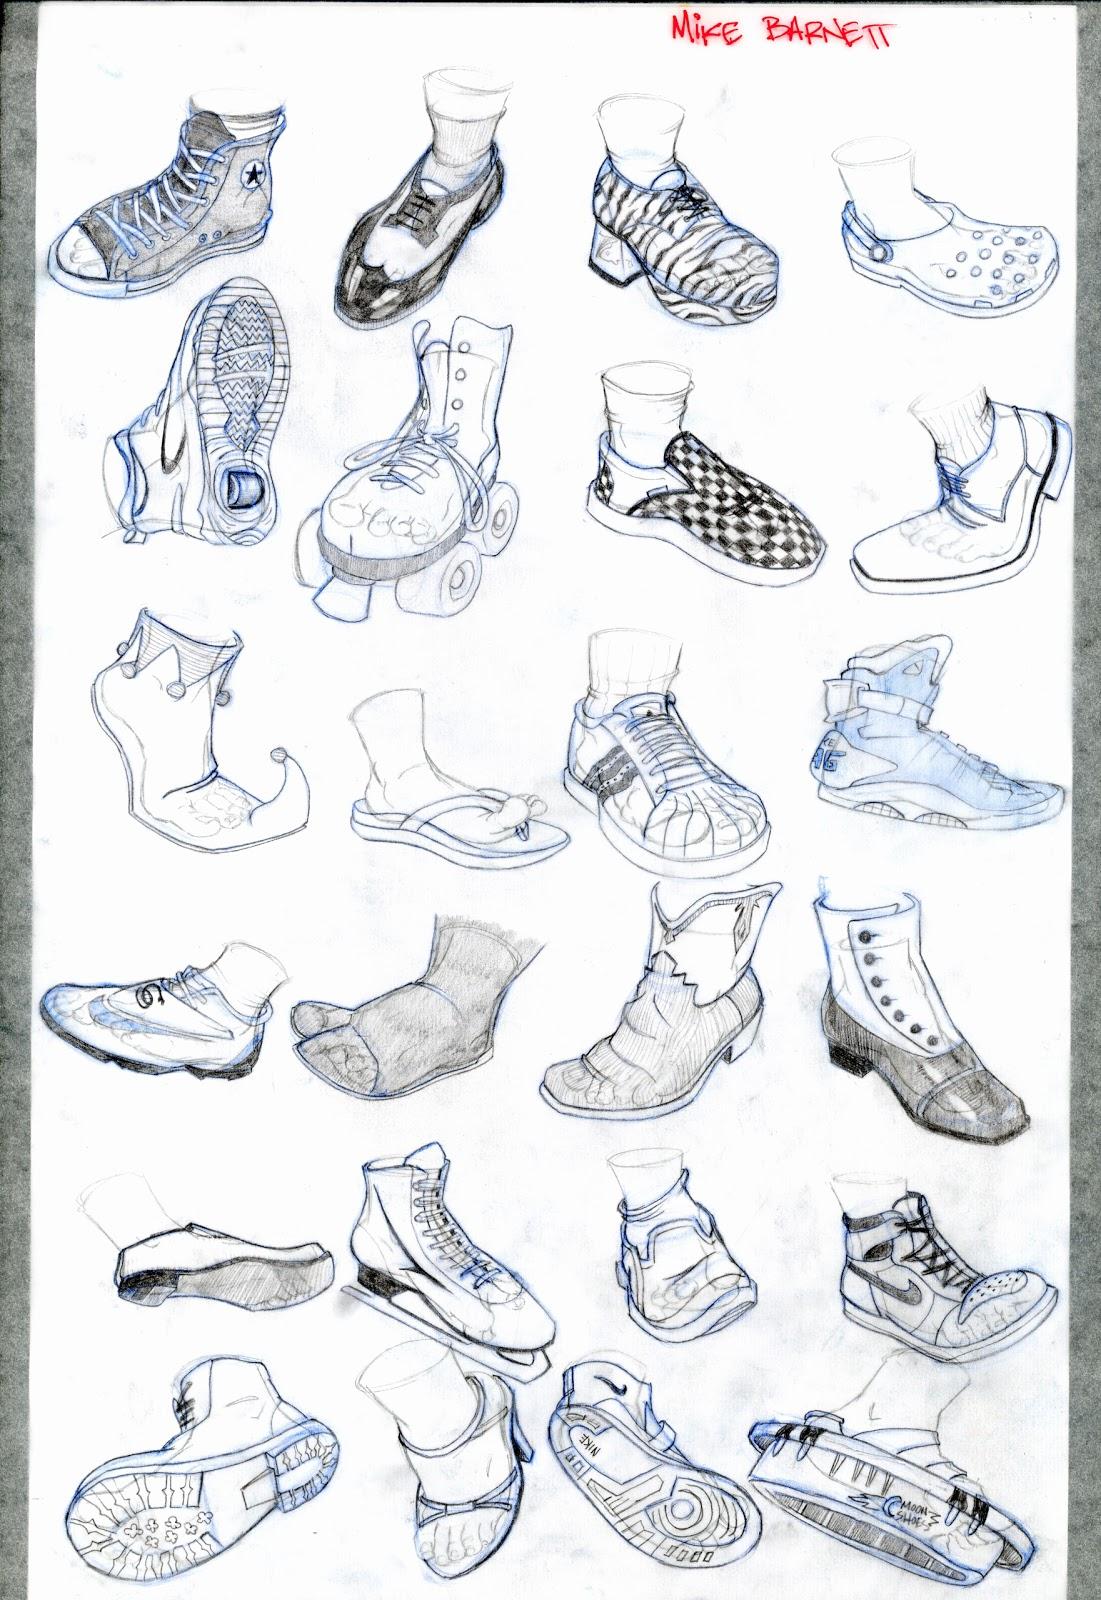 Drawn shoe foot Shoe Anatomy Shoes Skills Foot